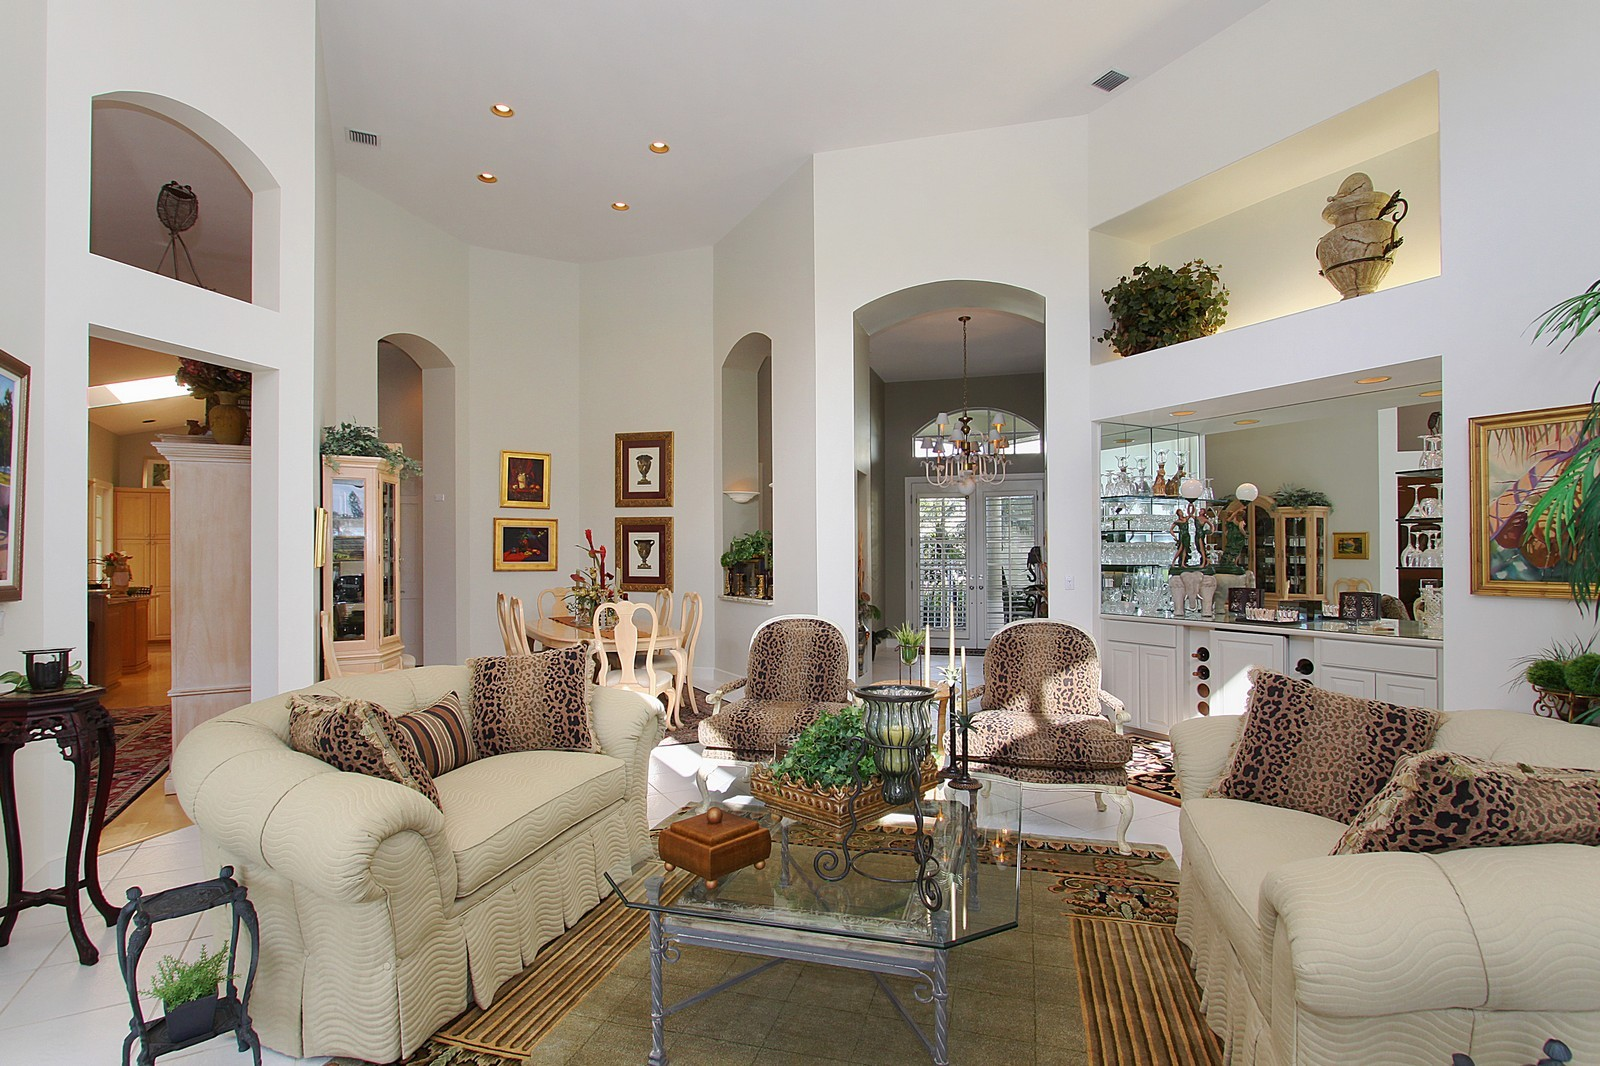 Real Estate Photography - 6930 SE Lakeview Ter, Stuart, FL, 34996 - Living Room / Dining Room